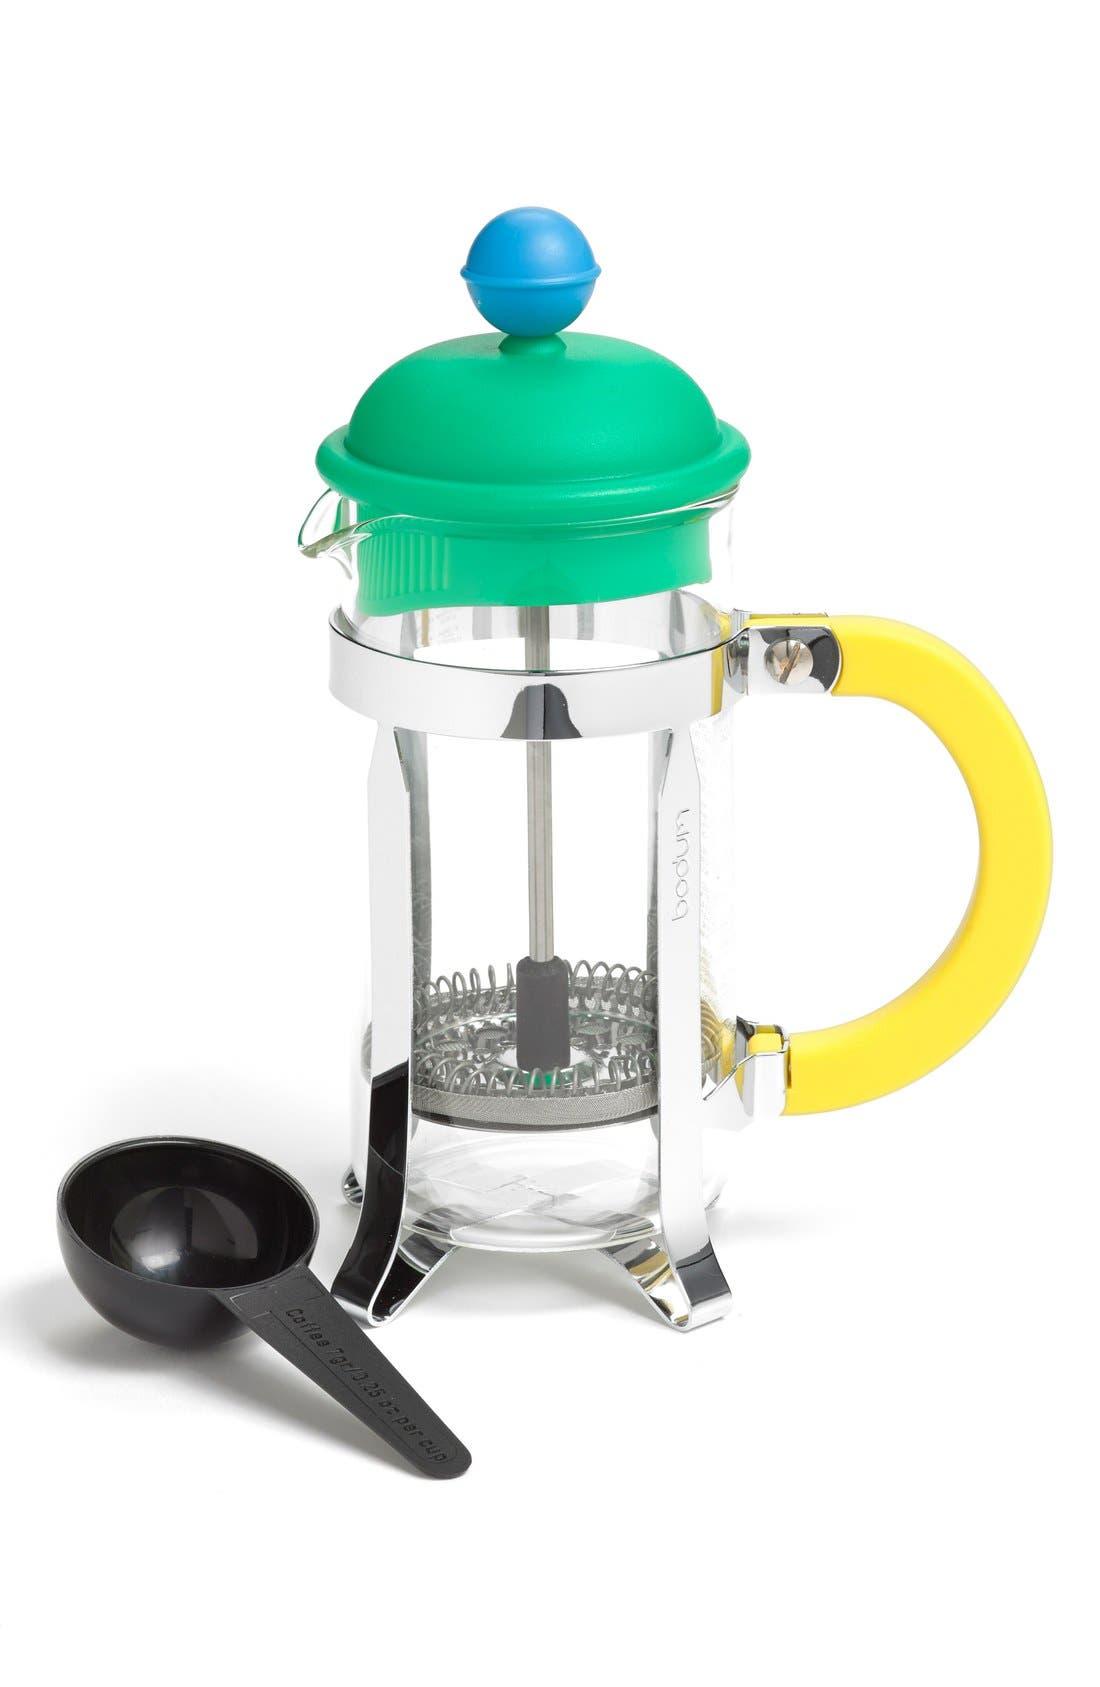 Caffettiera 12oz French Press Coffee Maker,                             Alternate thumbnail 2, color,                             300